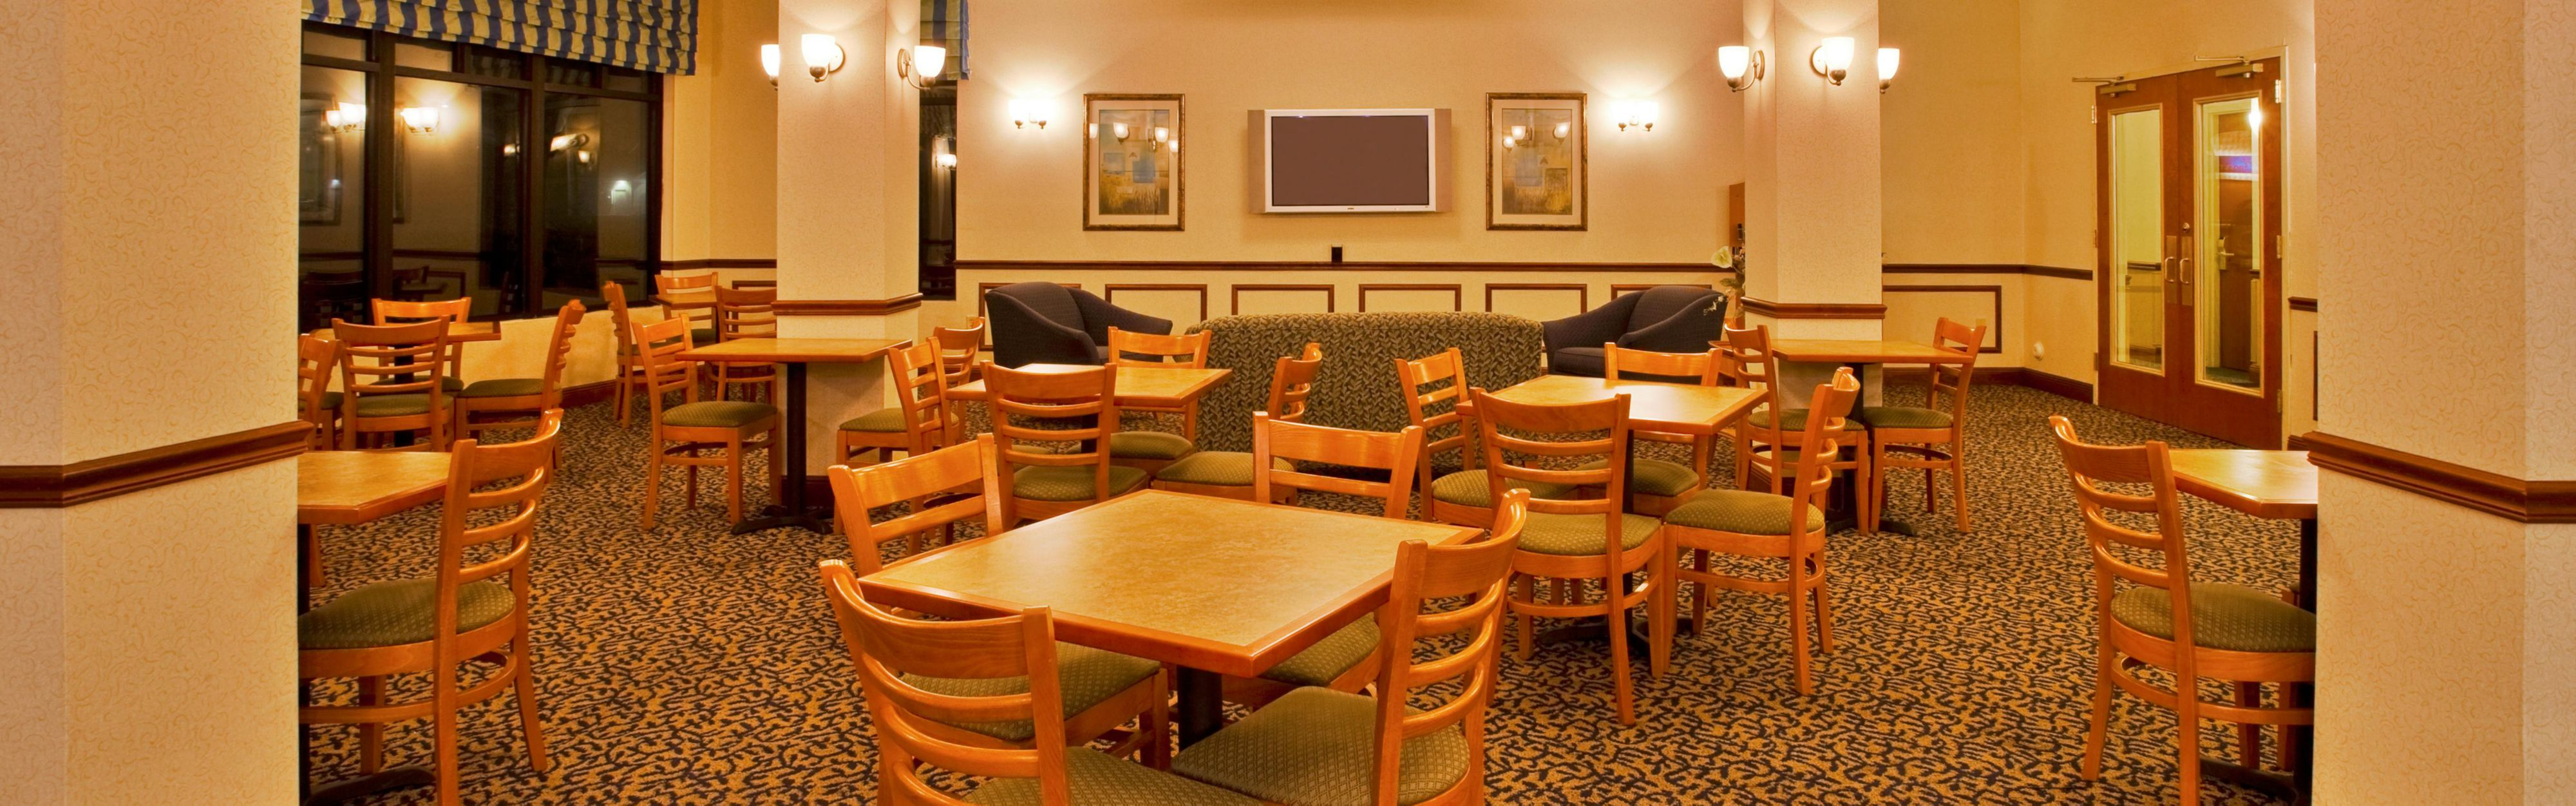 Holiday Inn Express & Suites Lake Okeechobee